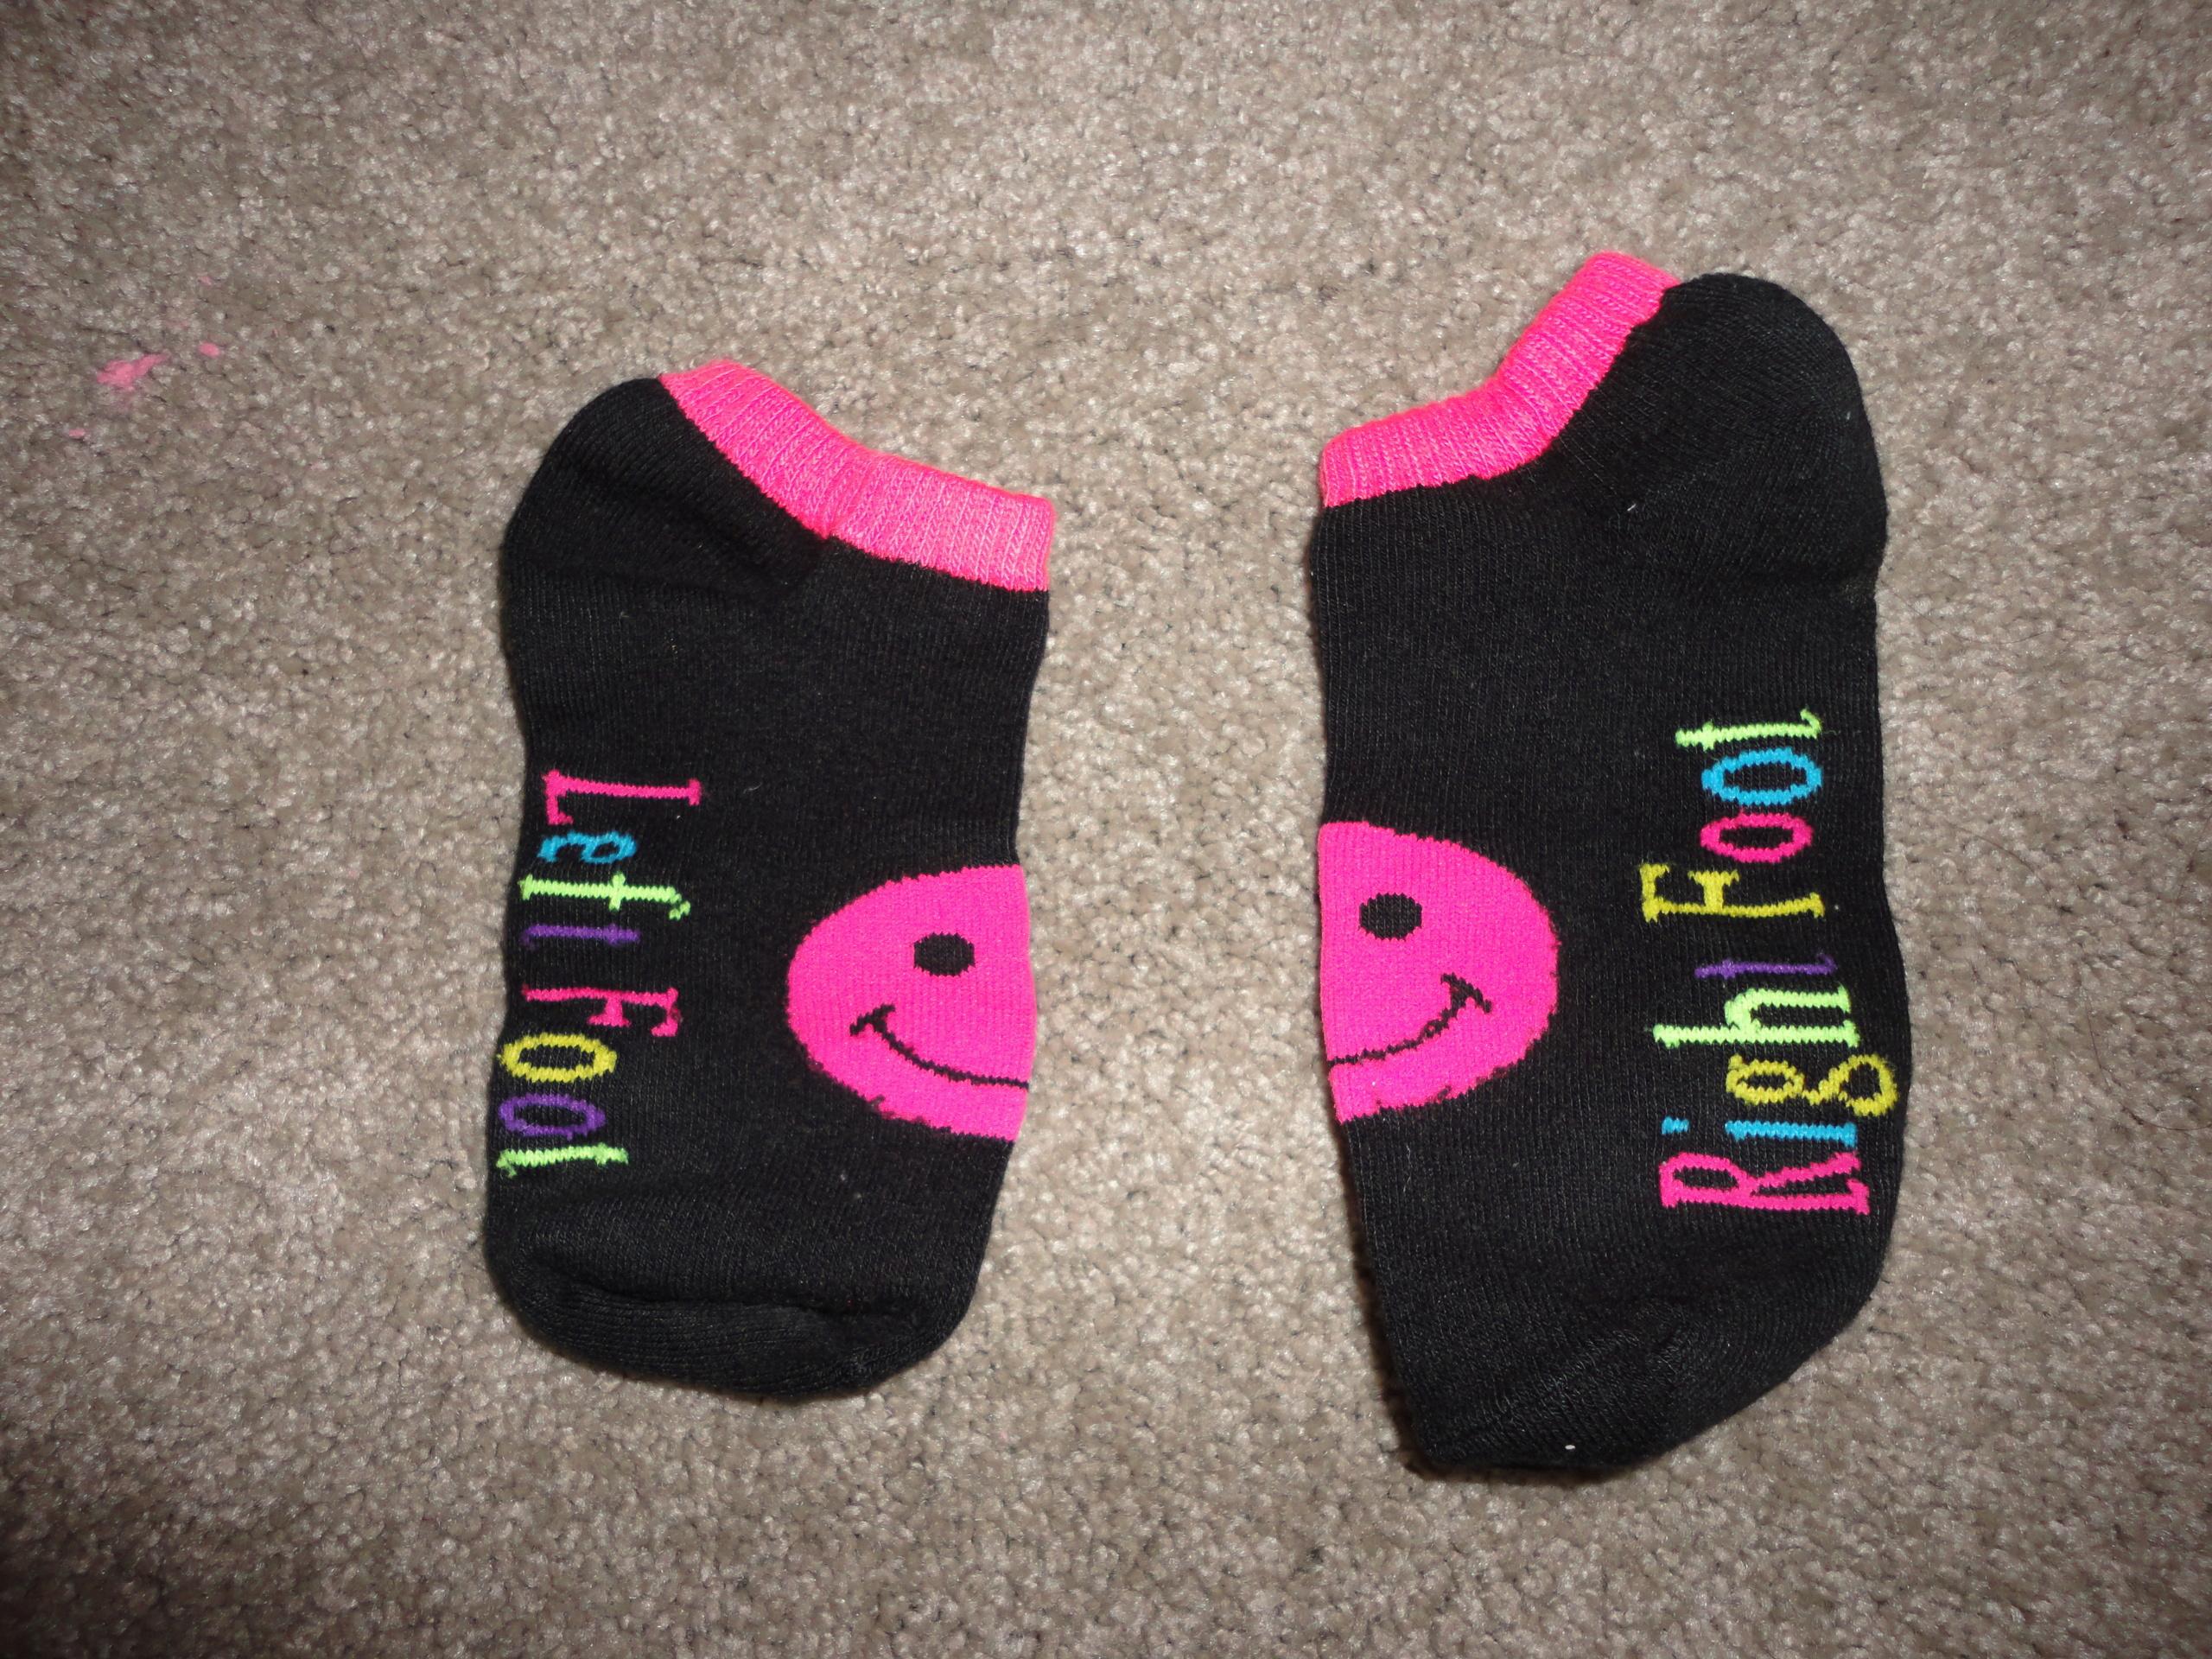 Crazy crazy socks 29760697 2560 1920